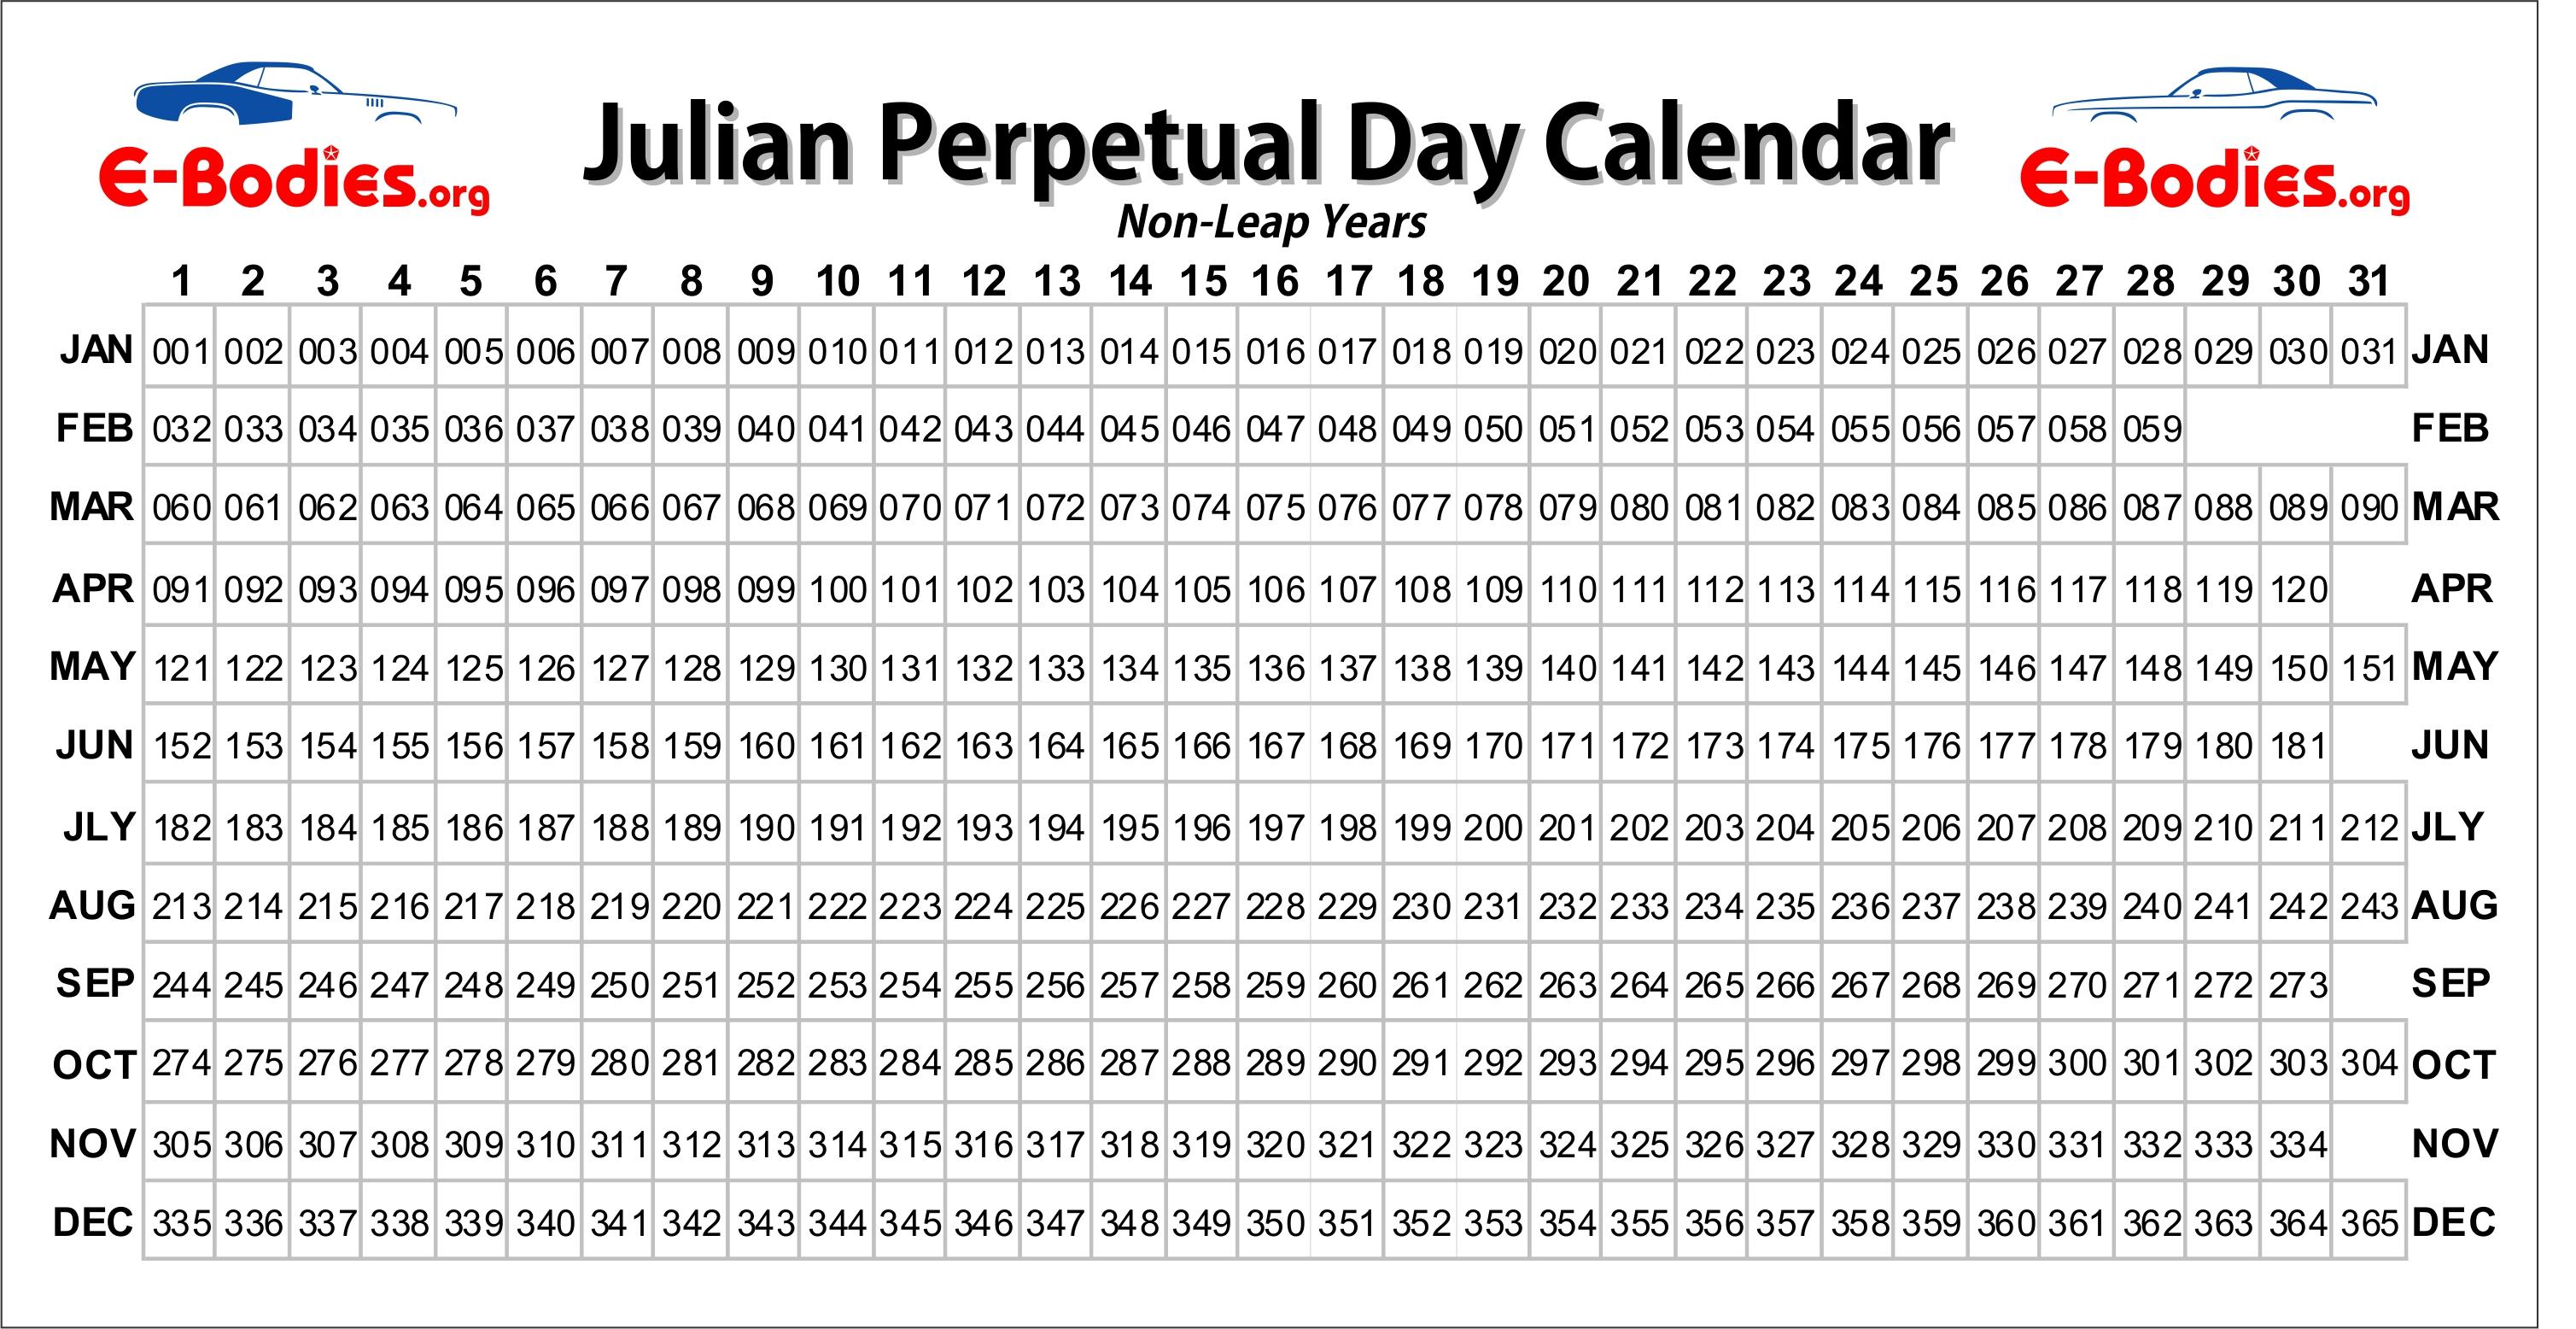 Mopar Julian Perpetual Day Calendar – Ebodies with regard to Julian Date Calendar Leap Year